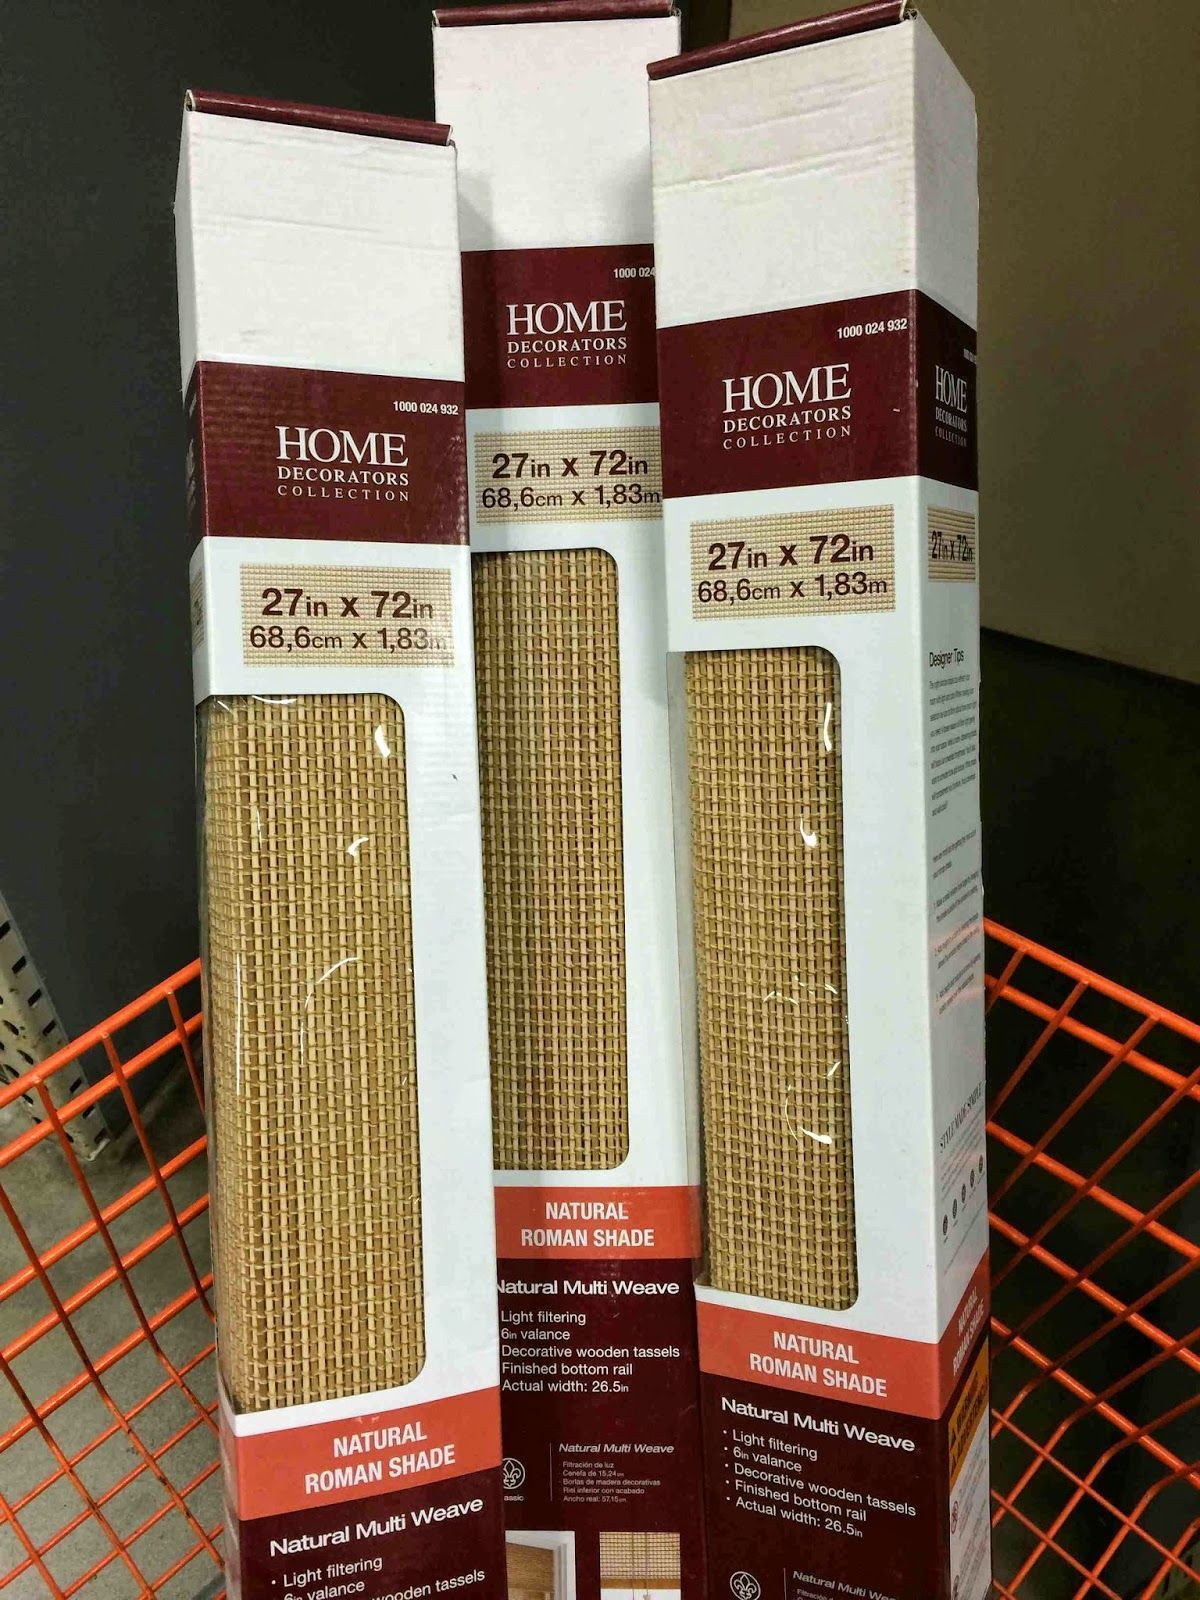 Home Decorators Collection Bamboo Blinds Available At Home Depot In The Honey Co Bamboo Bambu Hemligheten Fonsterdekorationer